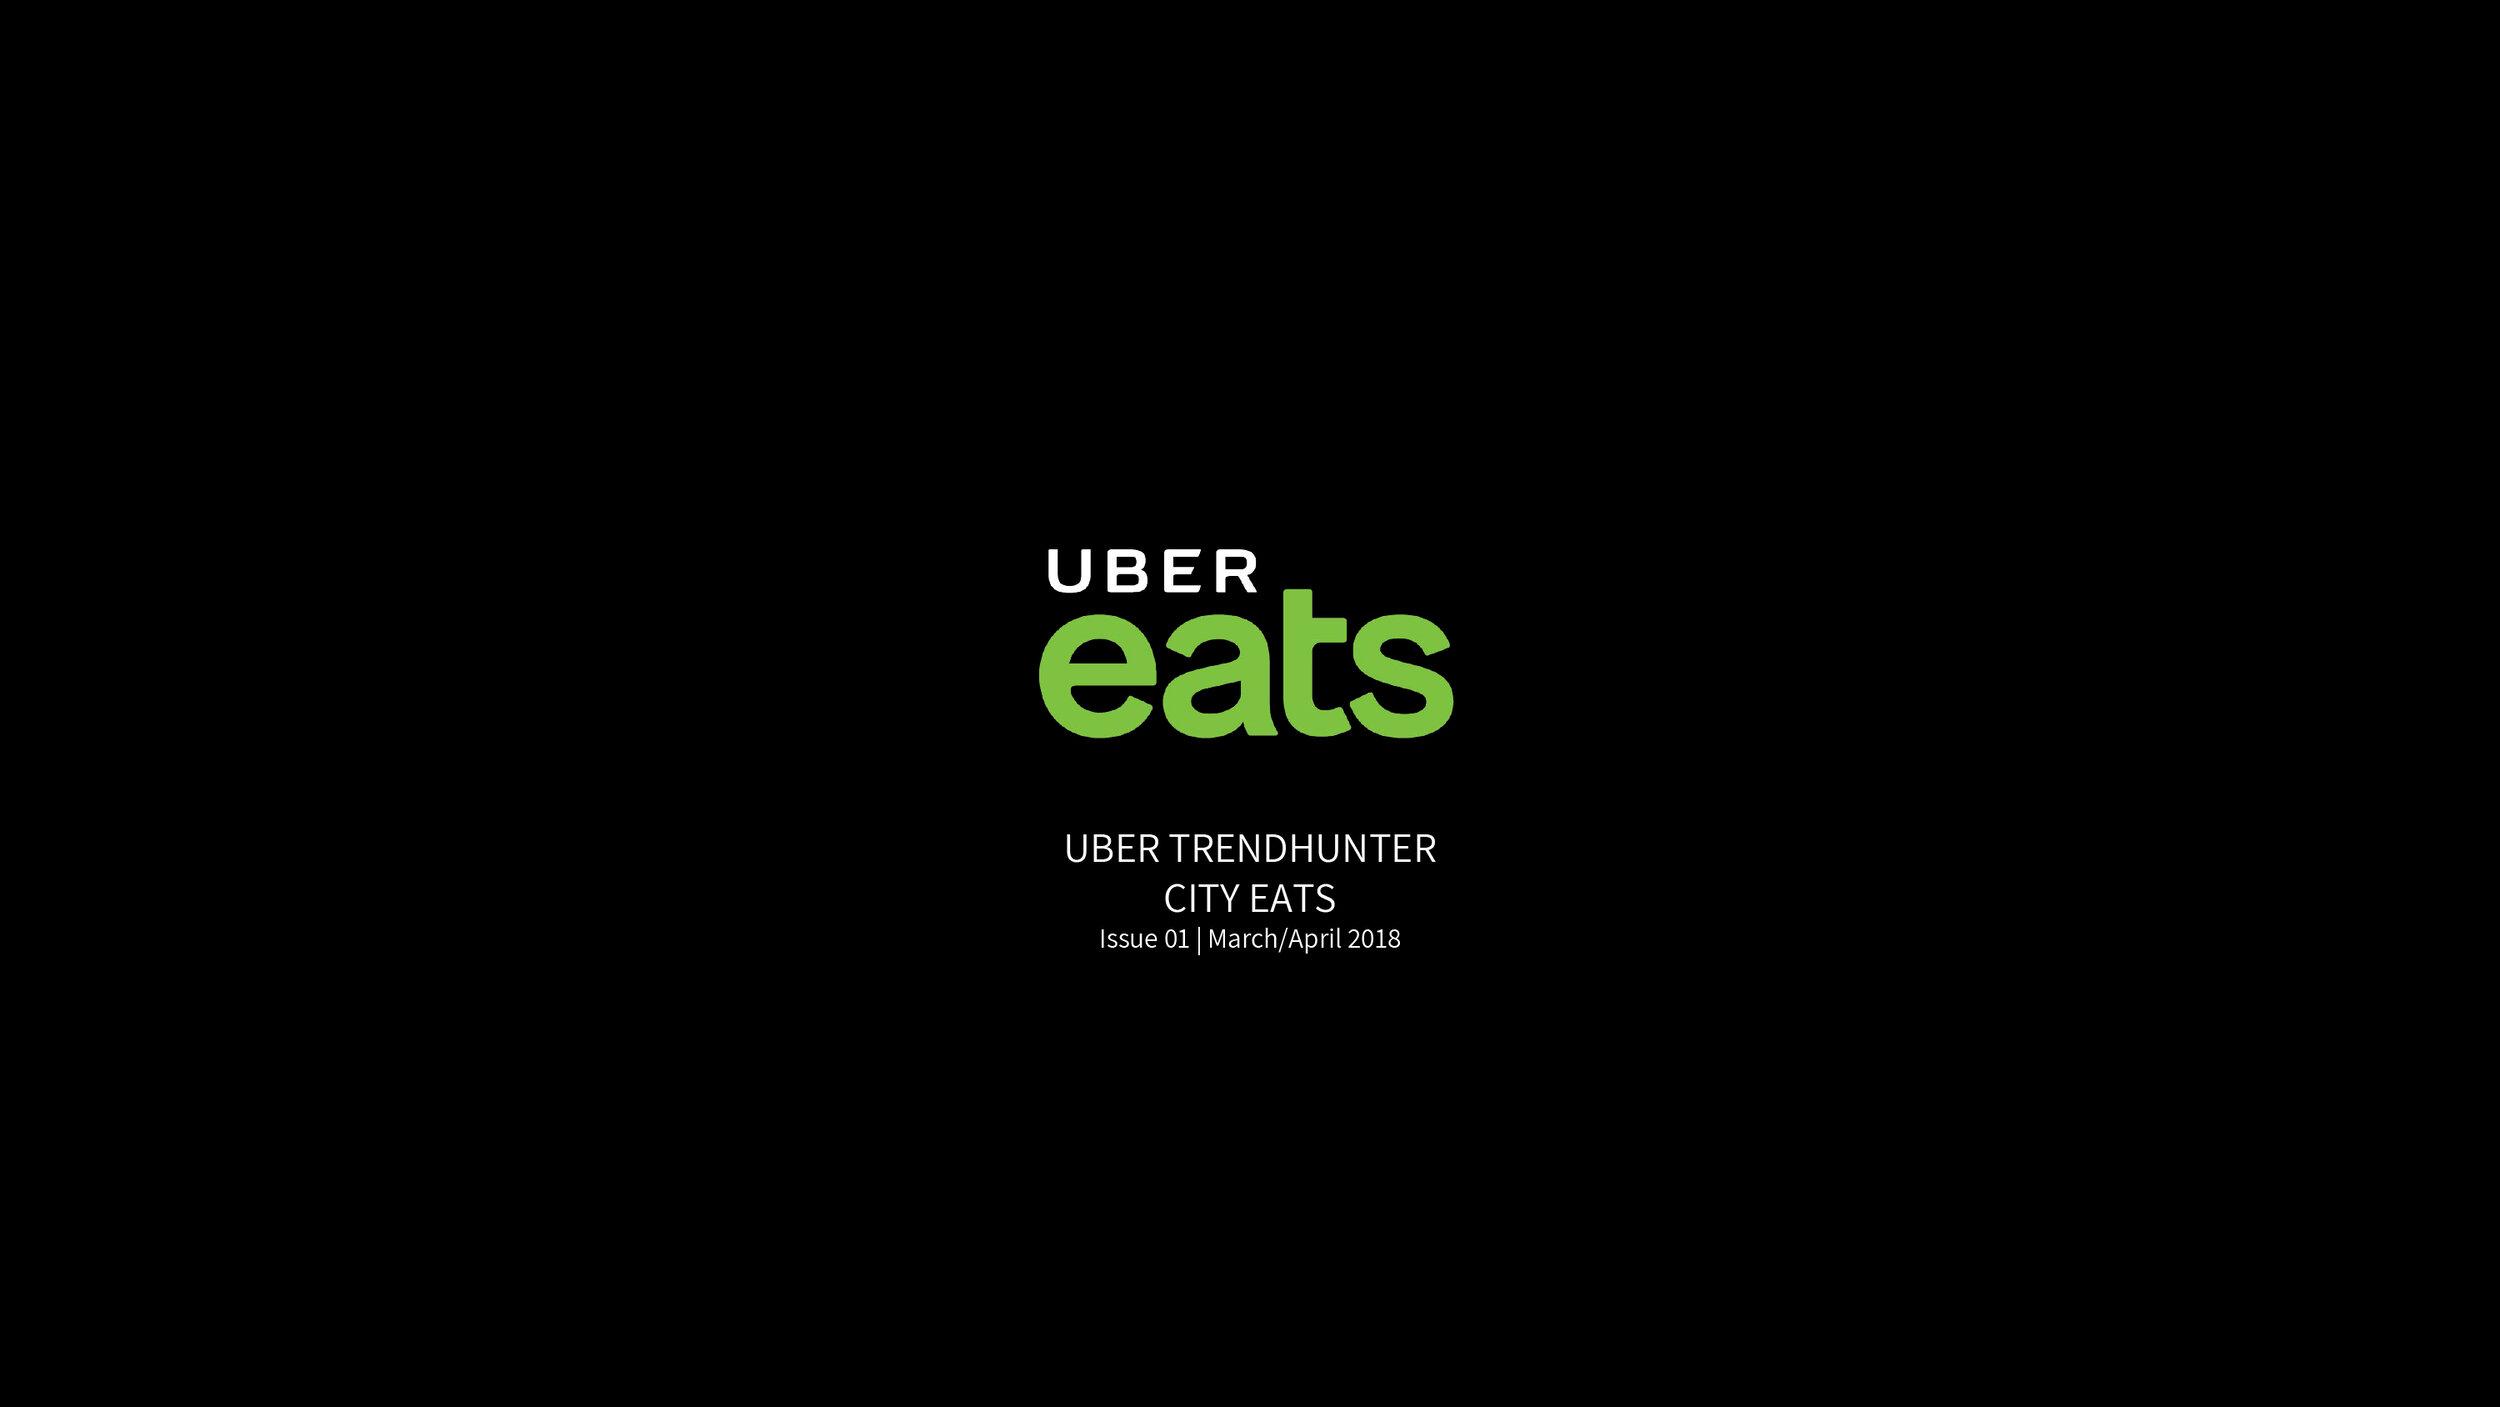 UberEATS-Trendhunter-01.jpg